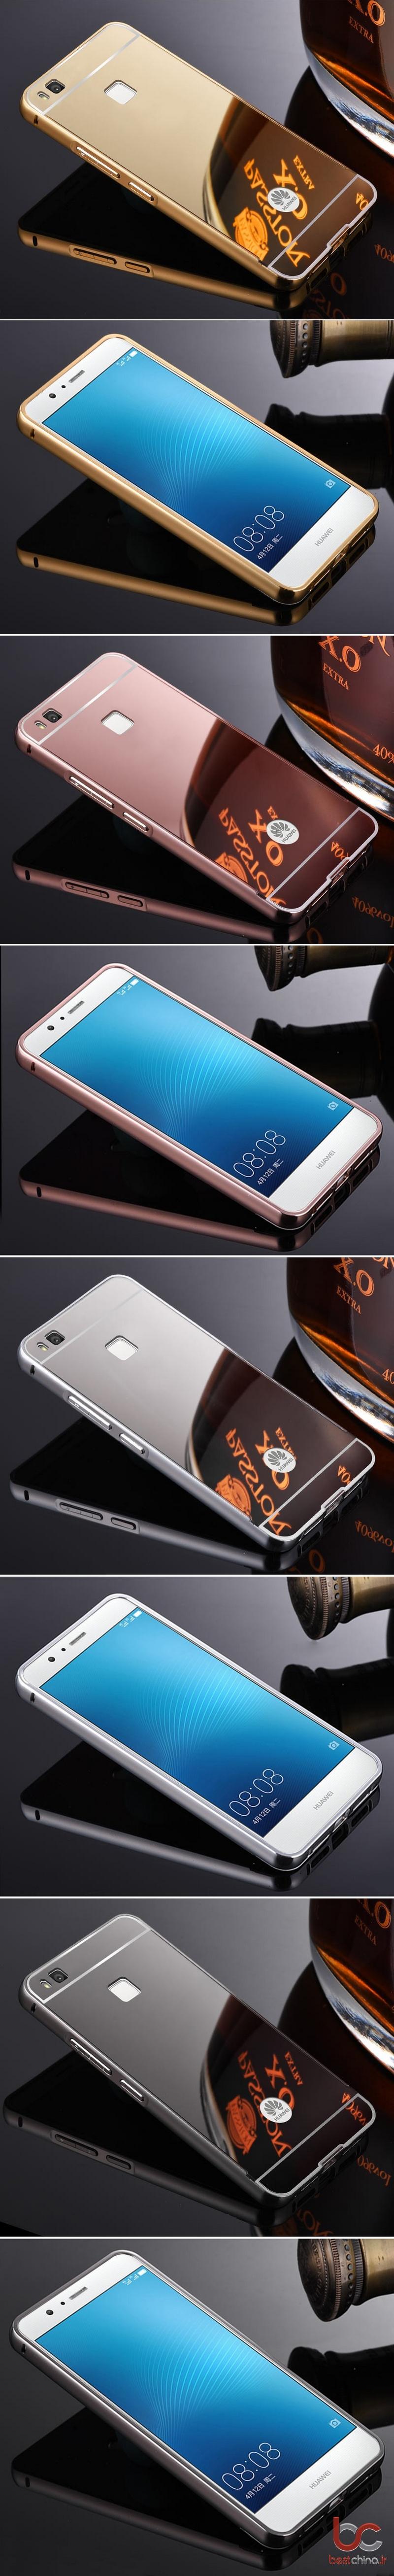 Huawei P9 Lite Aluminium Back Cover (2)